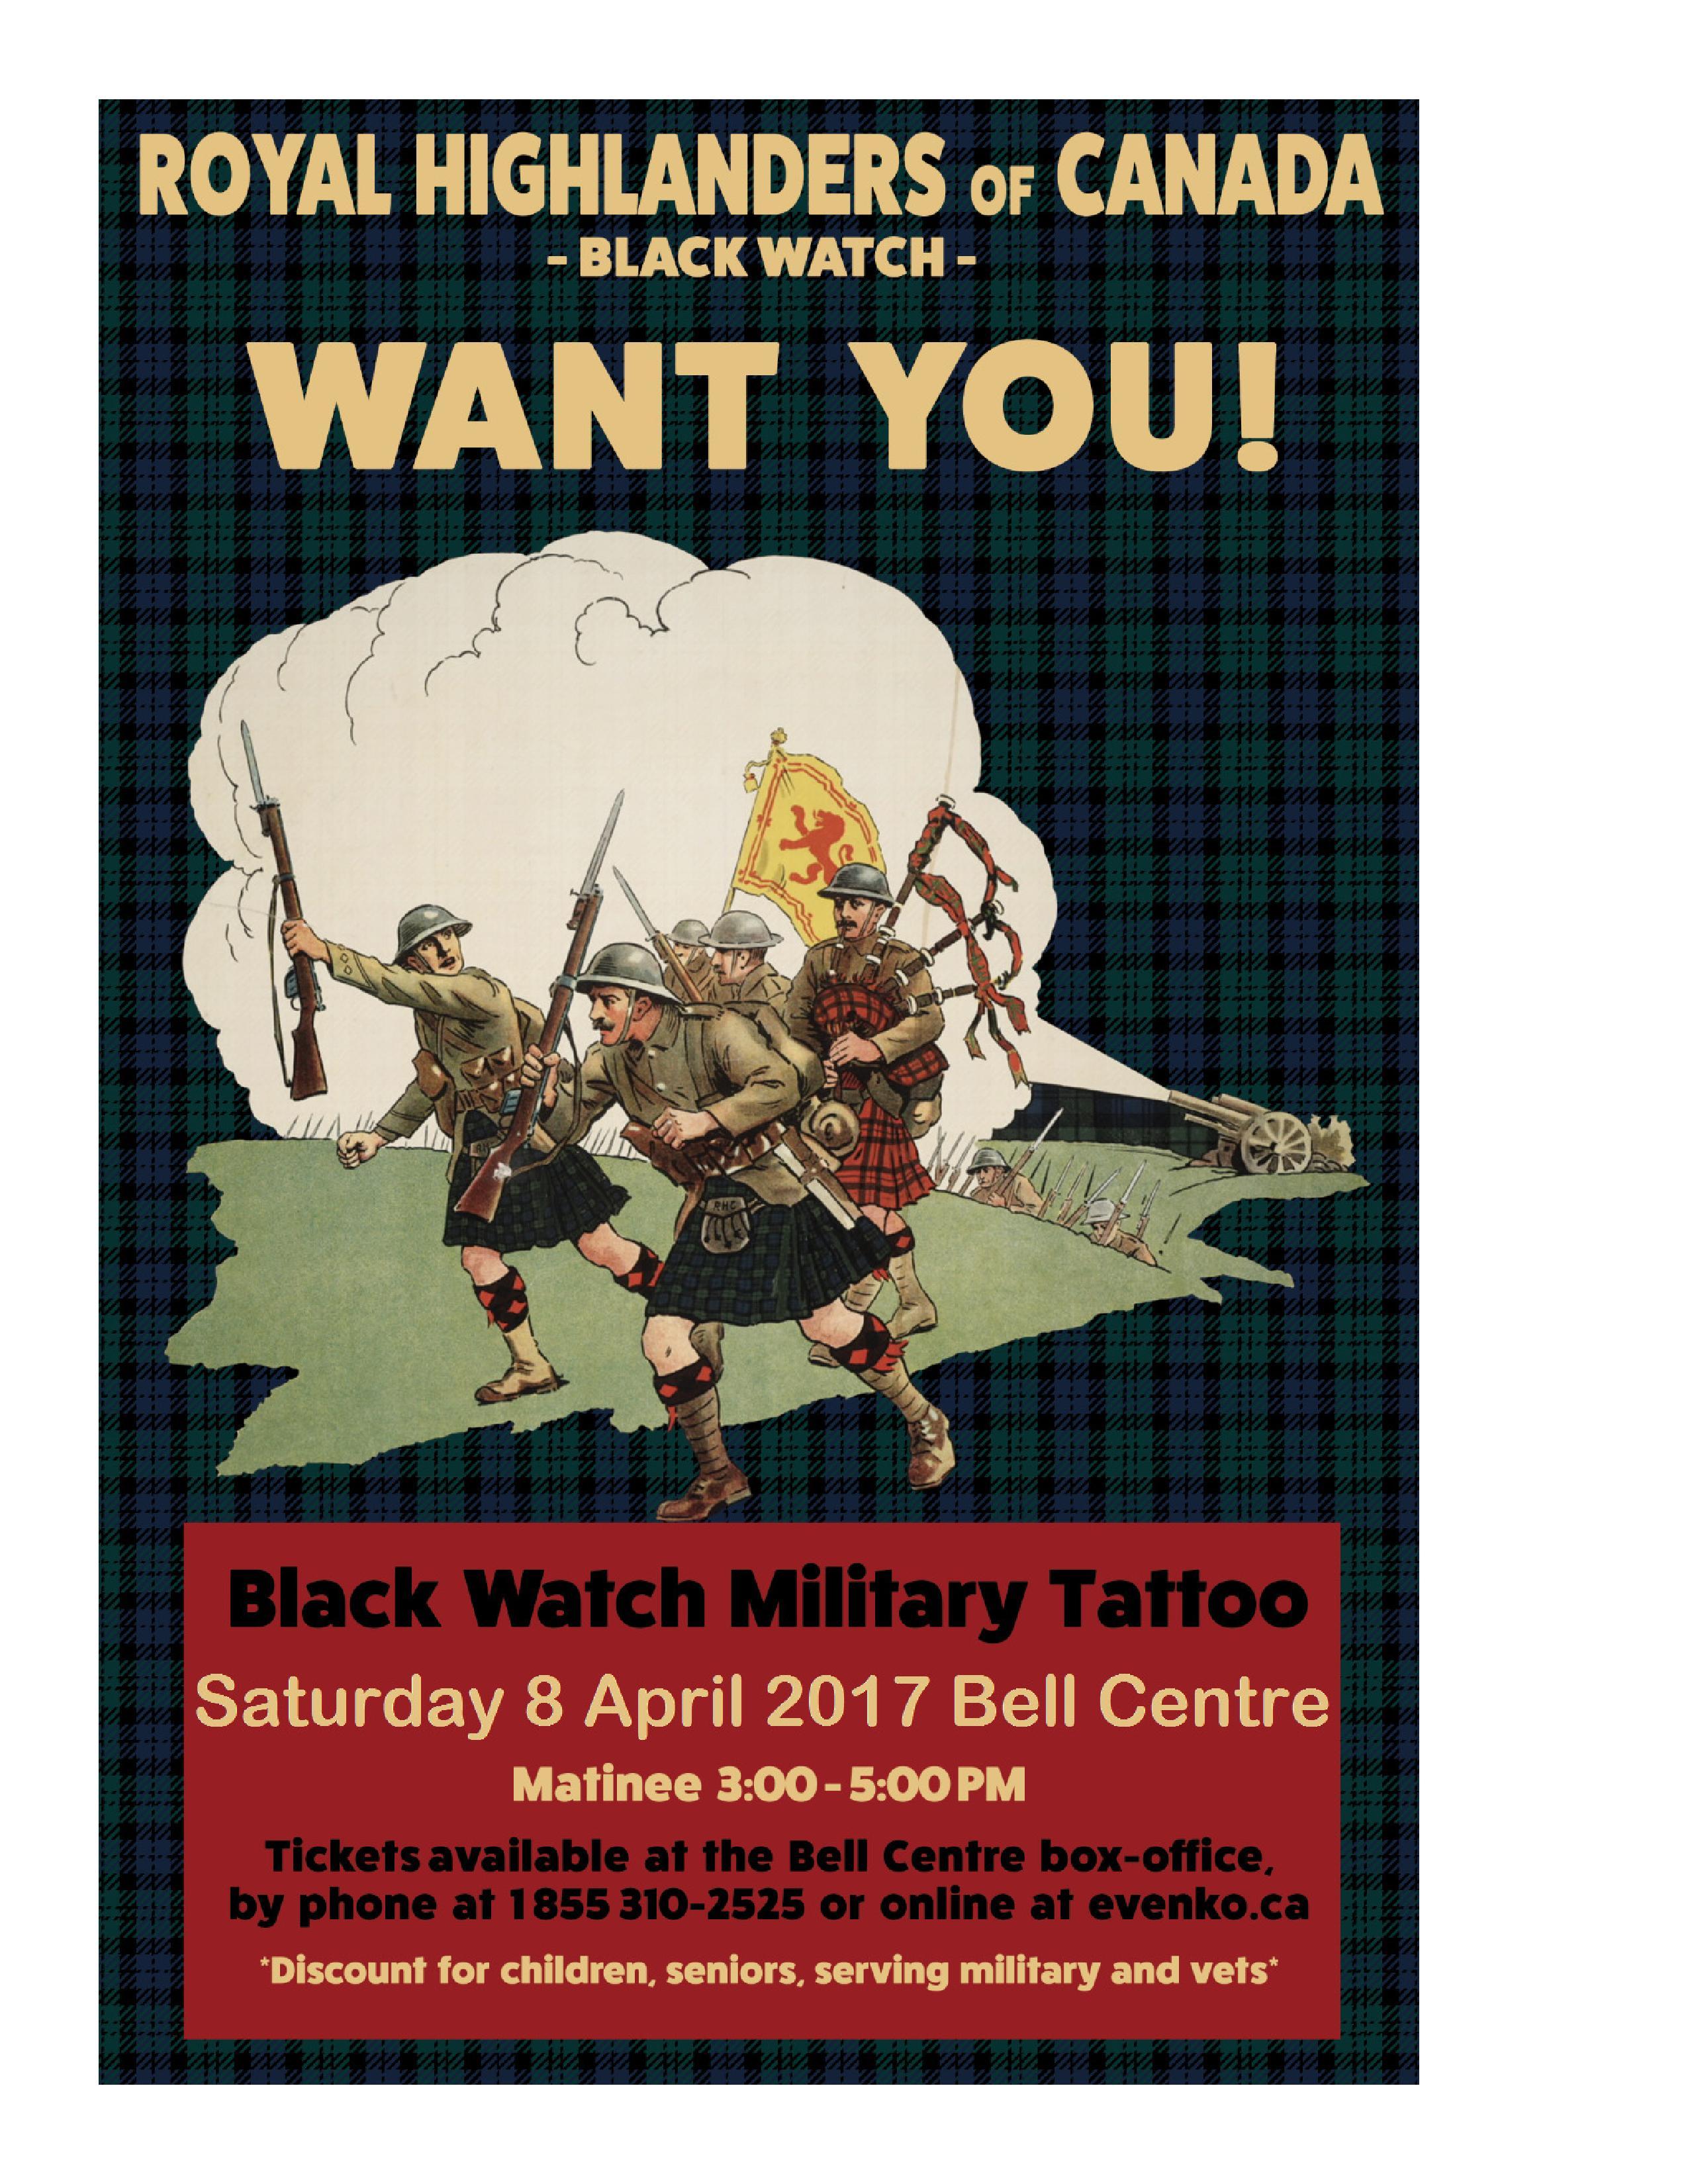 April 8, Montreal, QC - Black Watch Military Tattoo